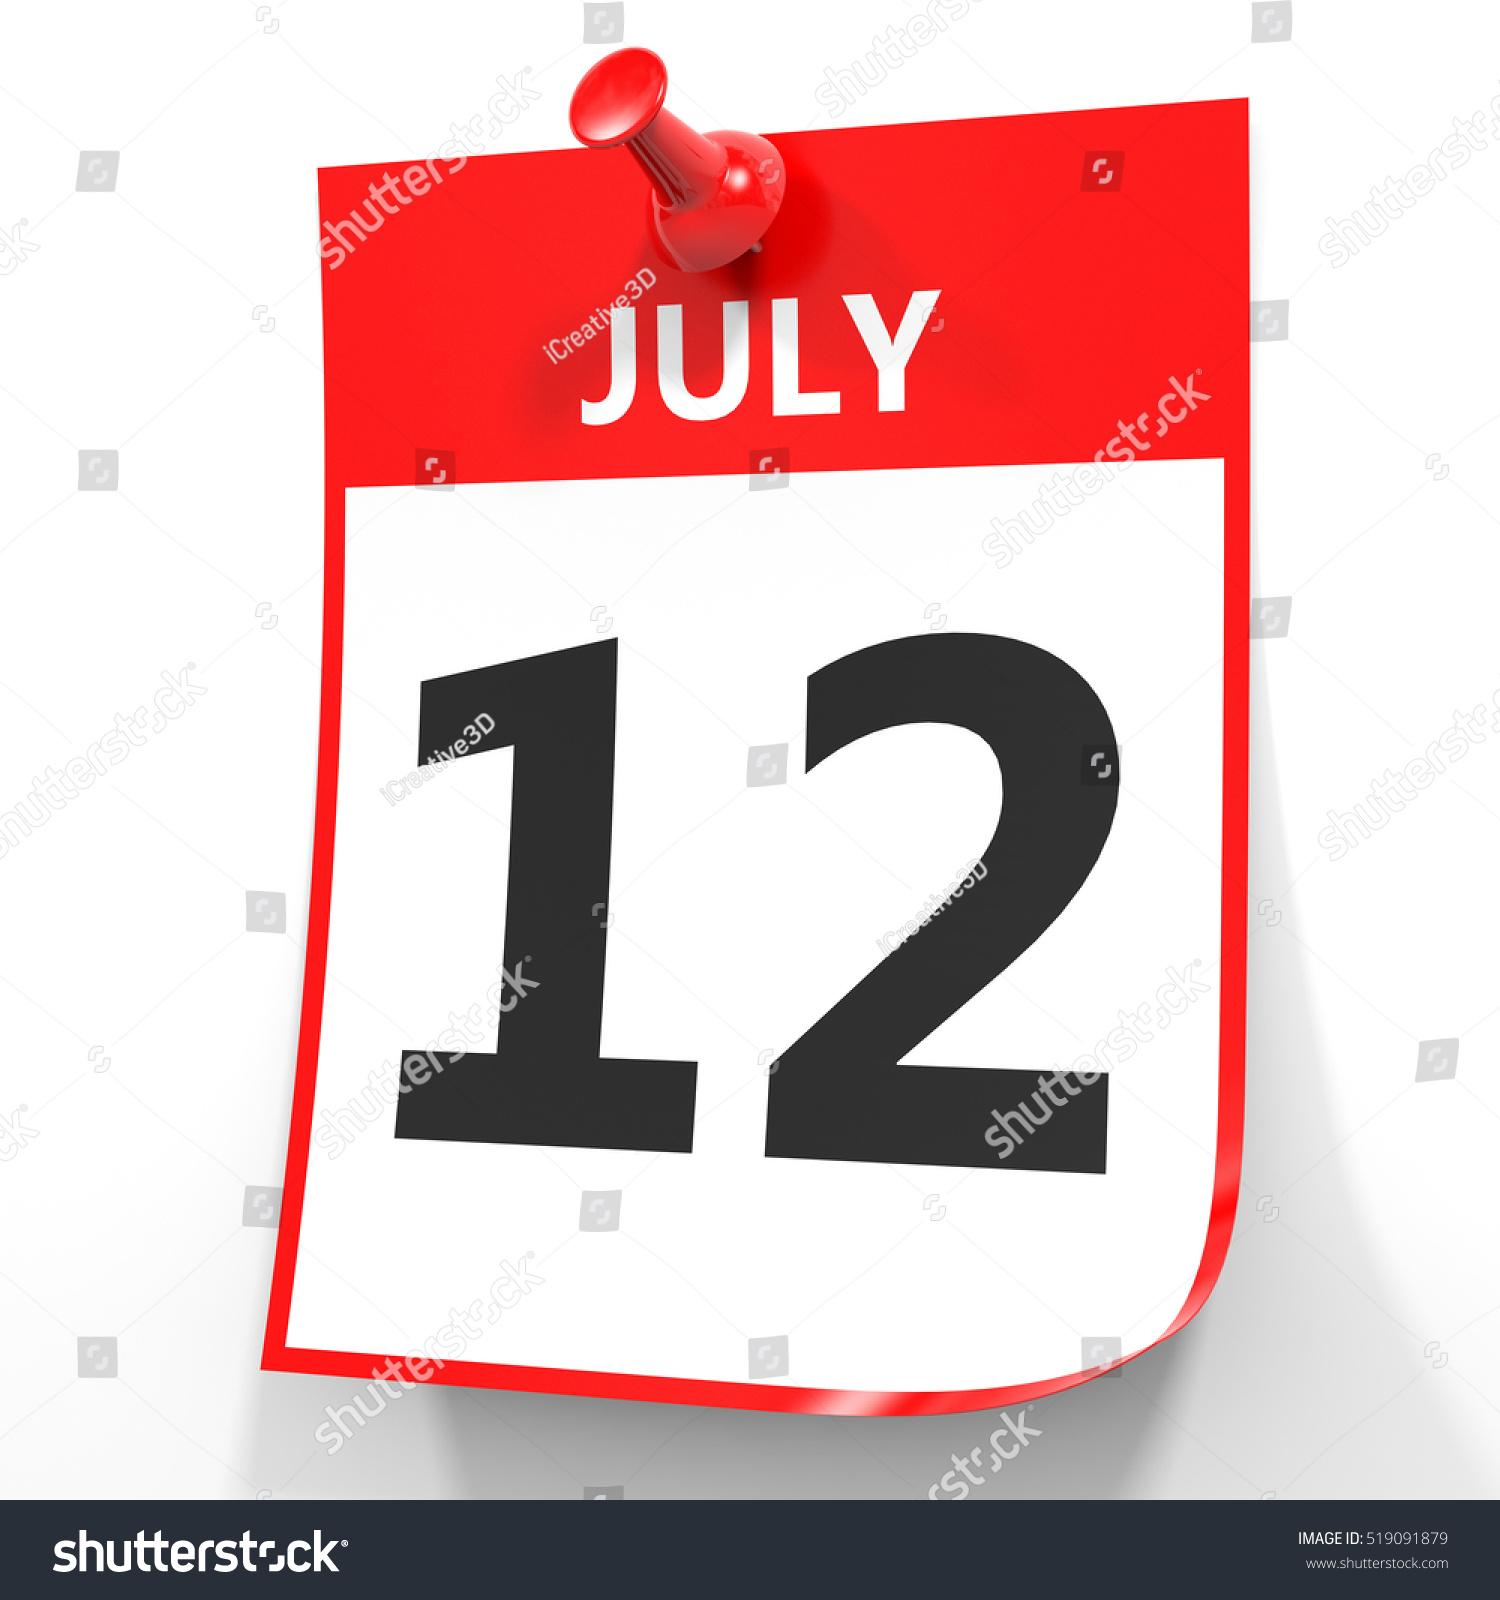 Calendar Illustration Search : July calendar on white background d illustration